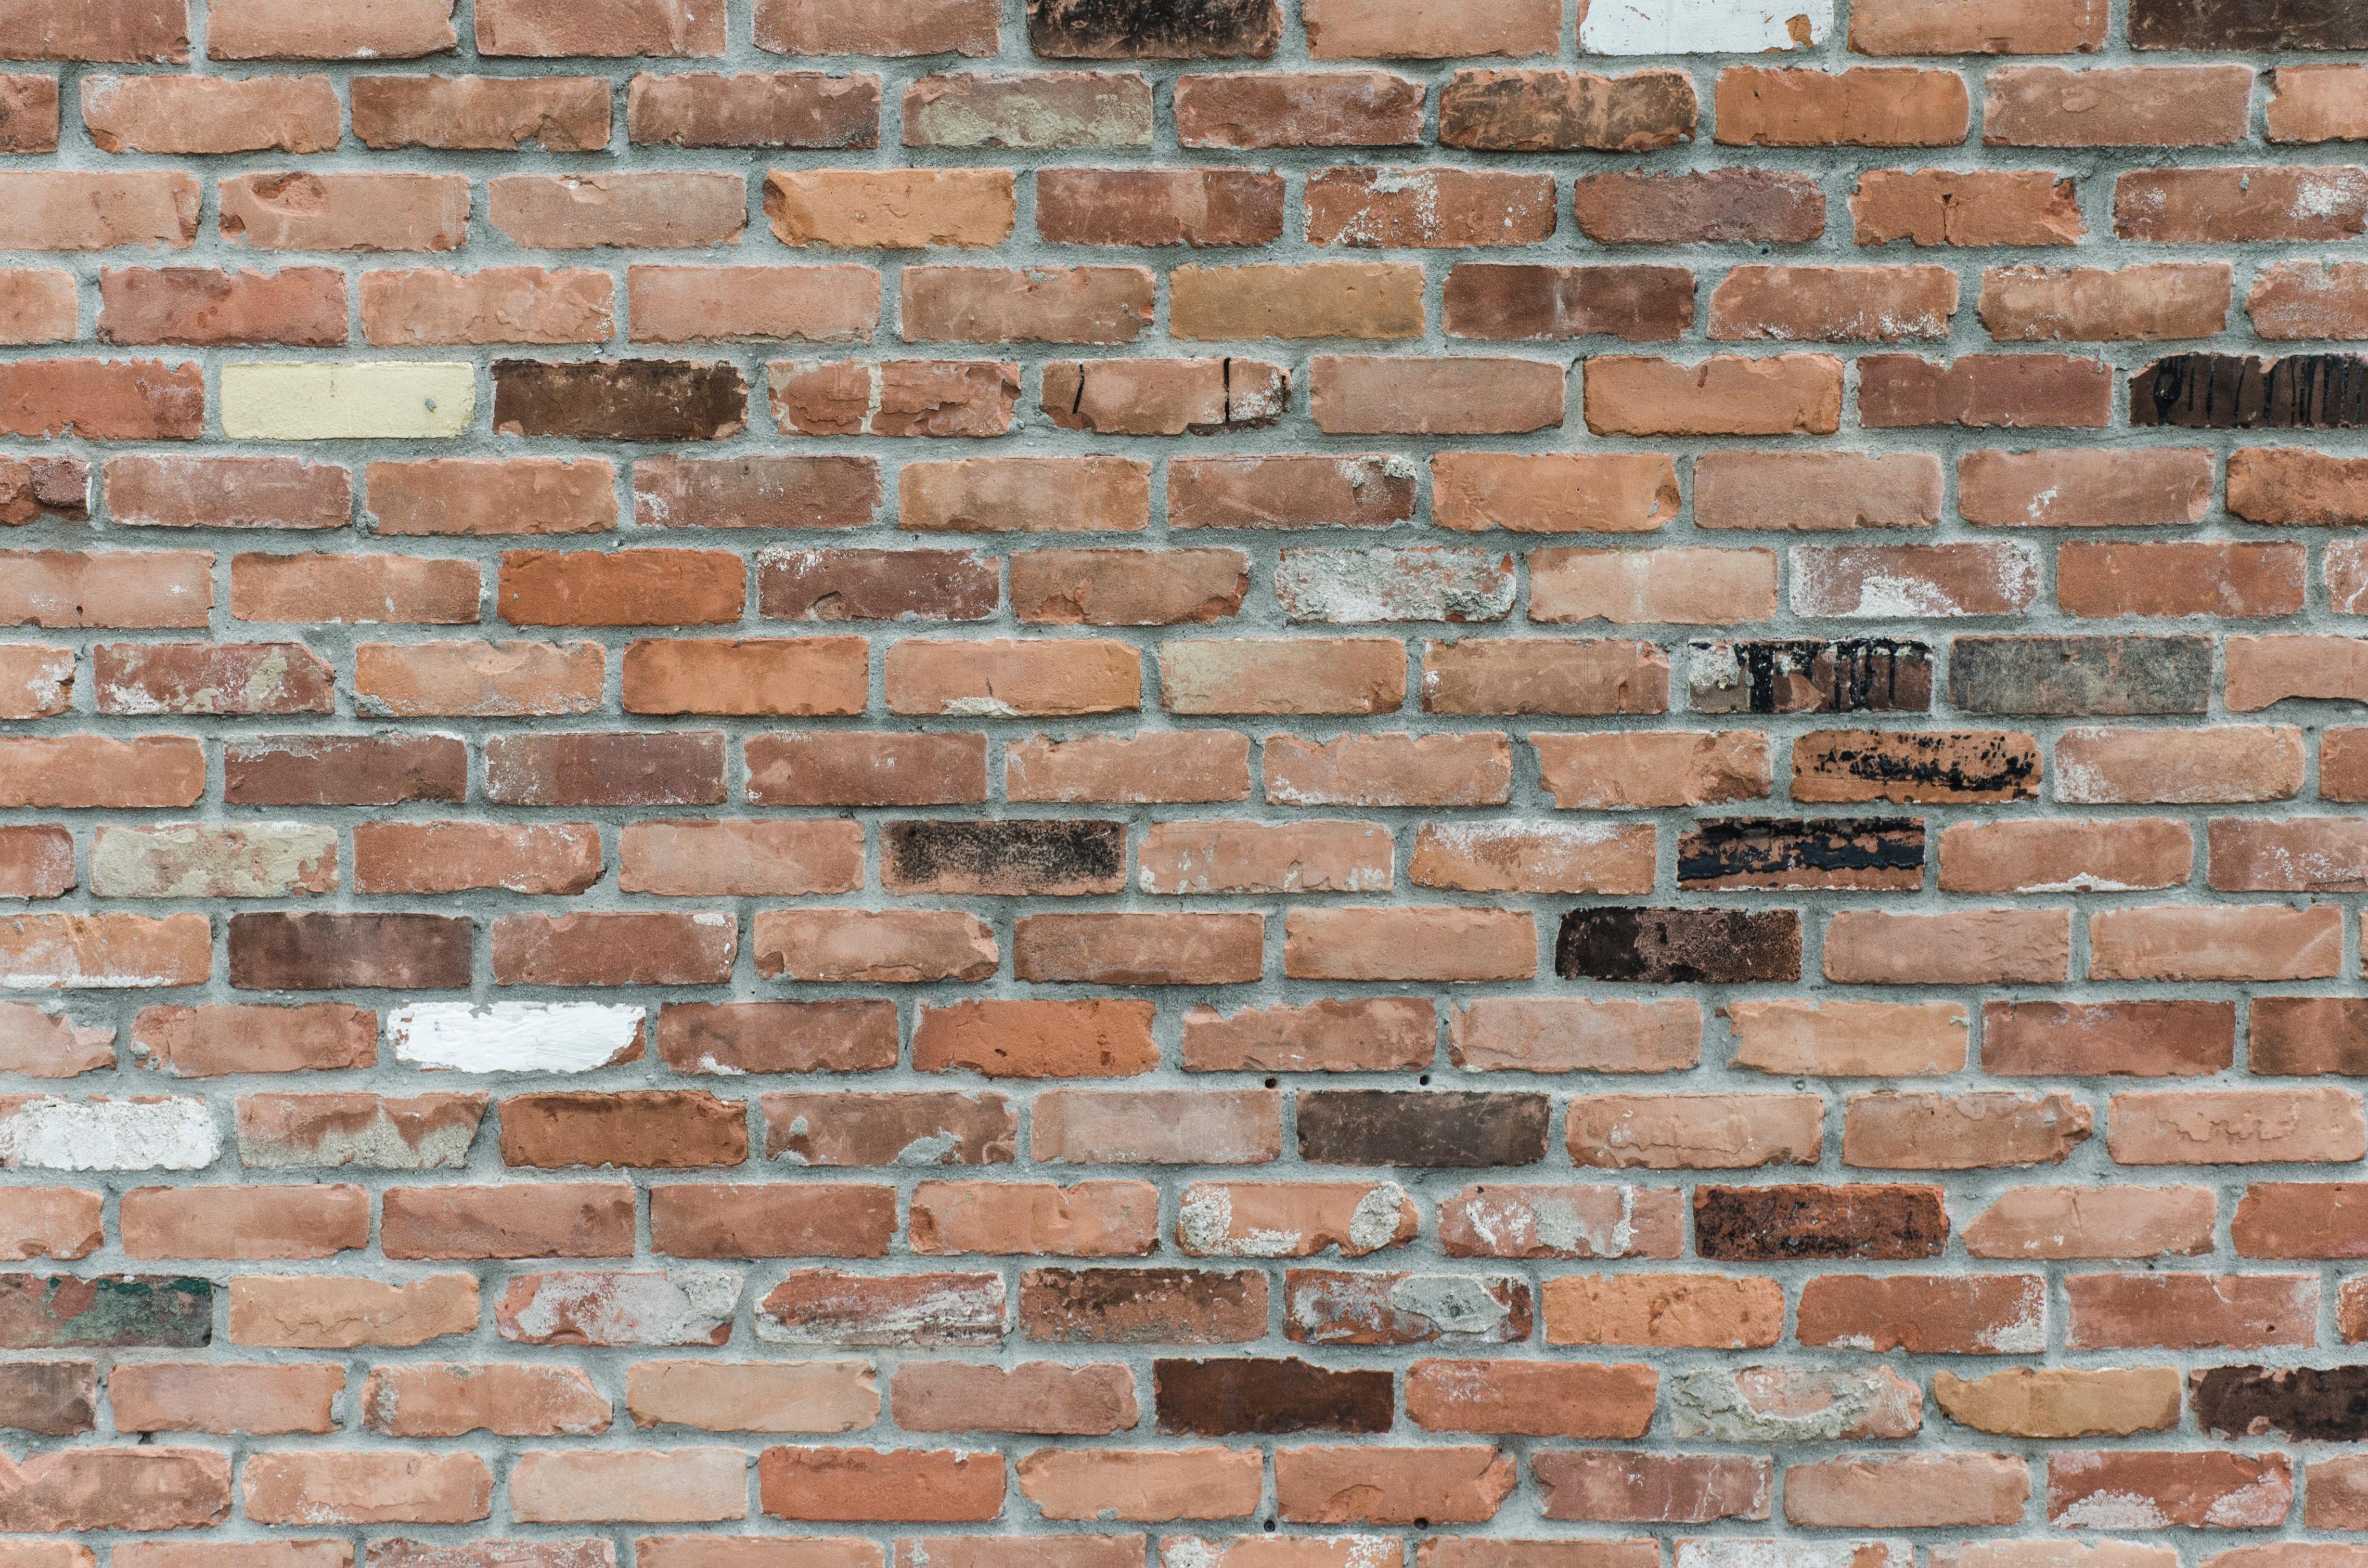 Free stock photos of brick wall · Pexels